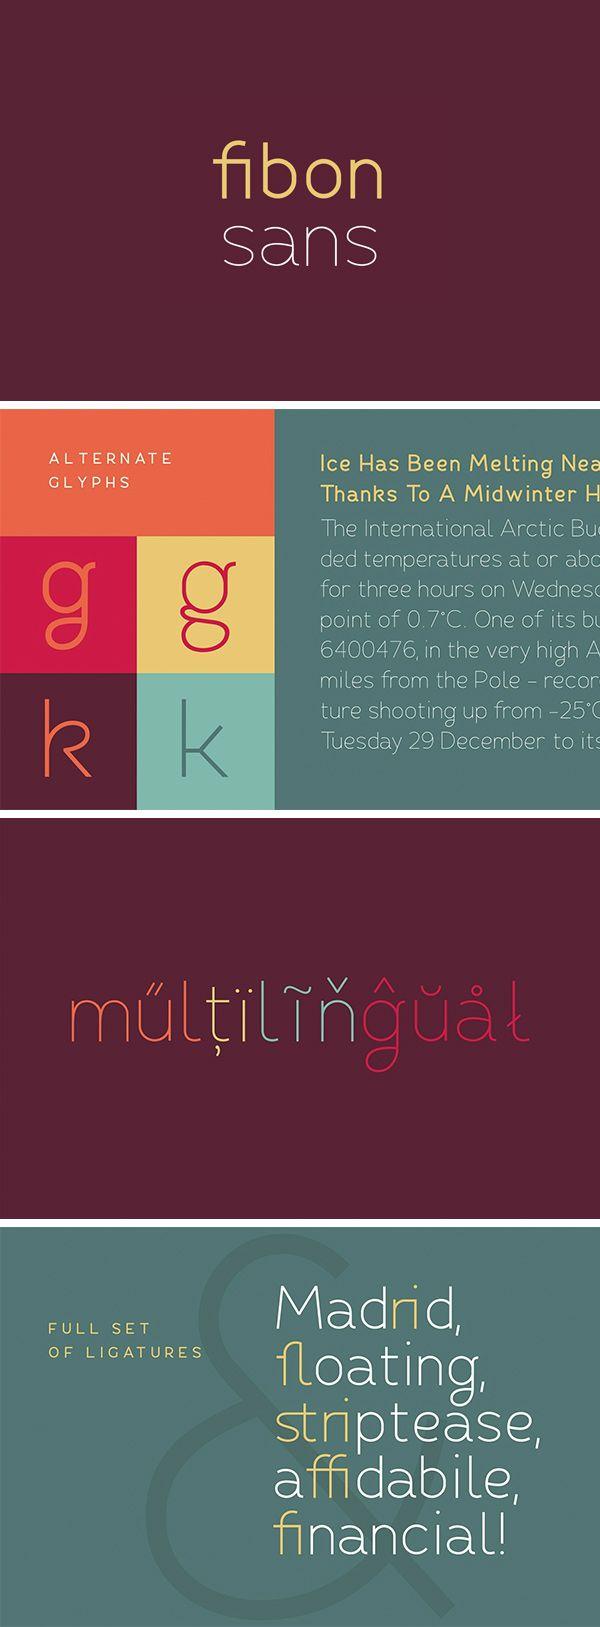 Fibon Sans – Regular Weight Free | GraphicBurger